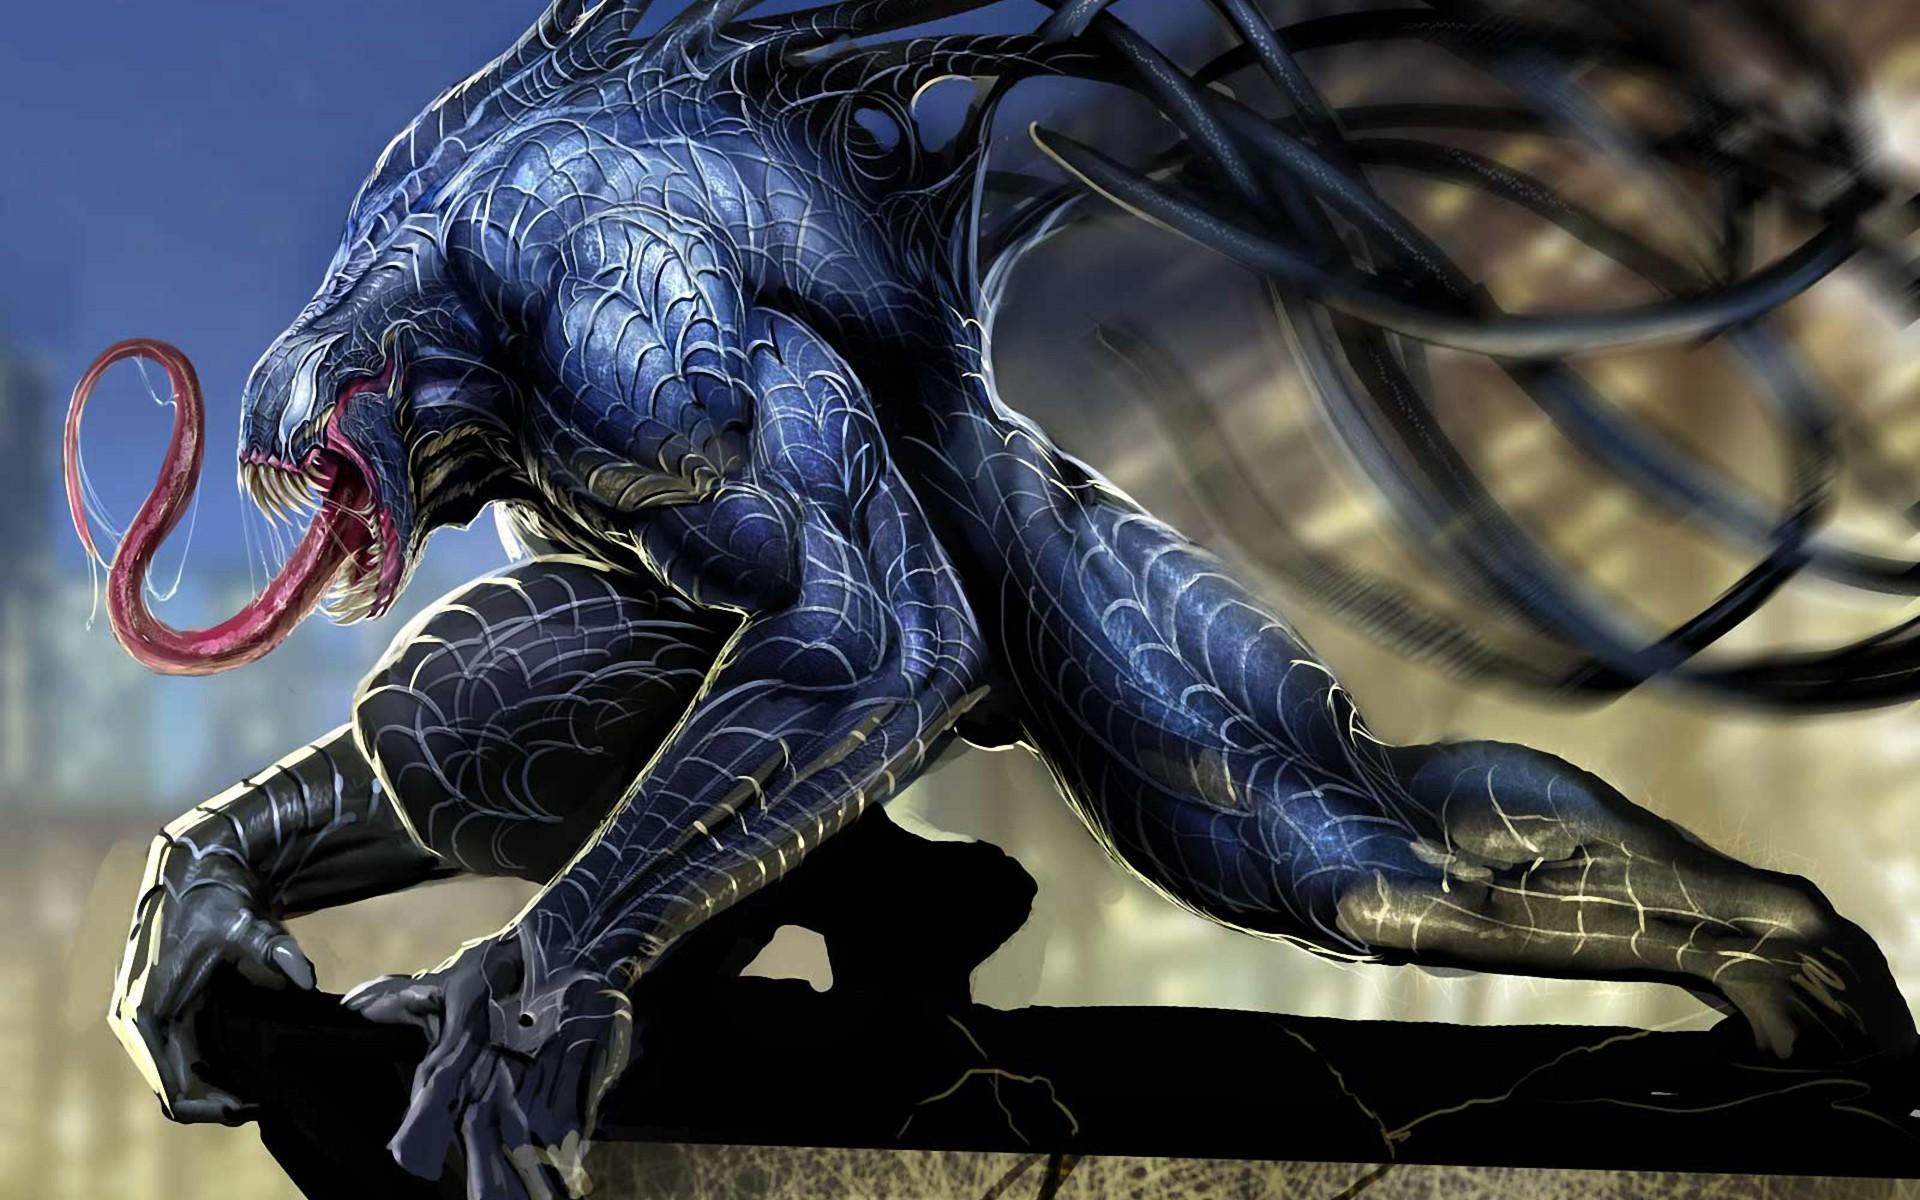 Venom, Comics, Marvel Comics Wallpapers HD / Desktop and Mobile Backgrounds